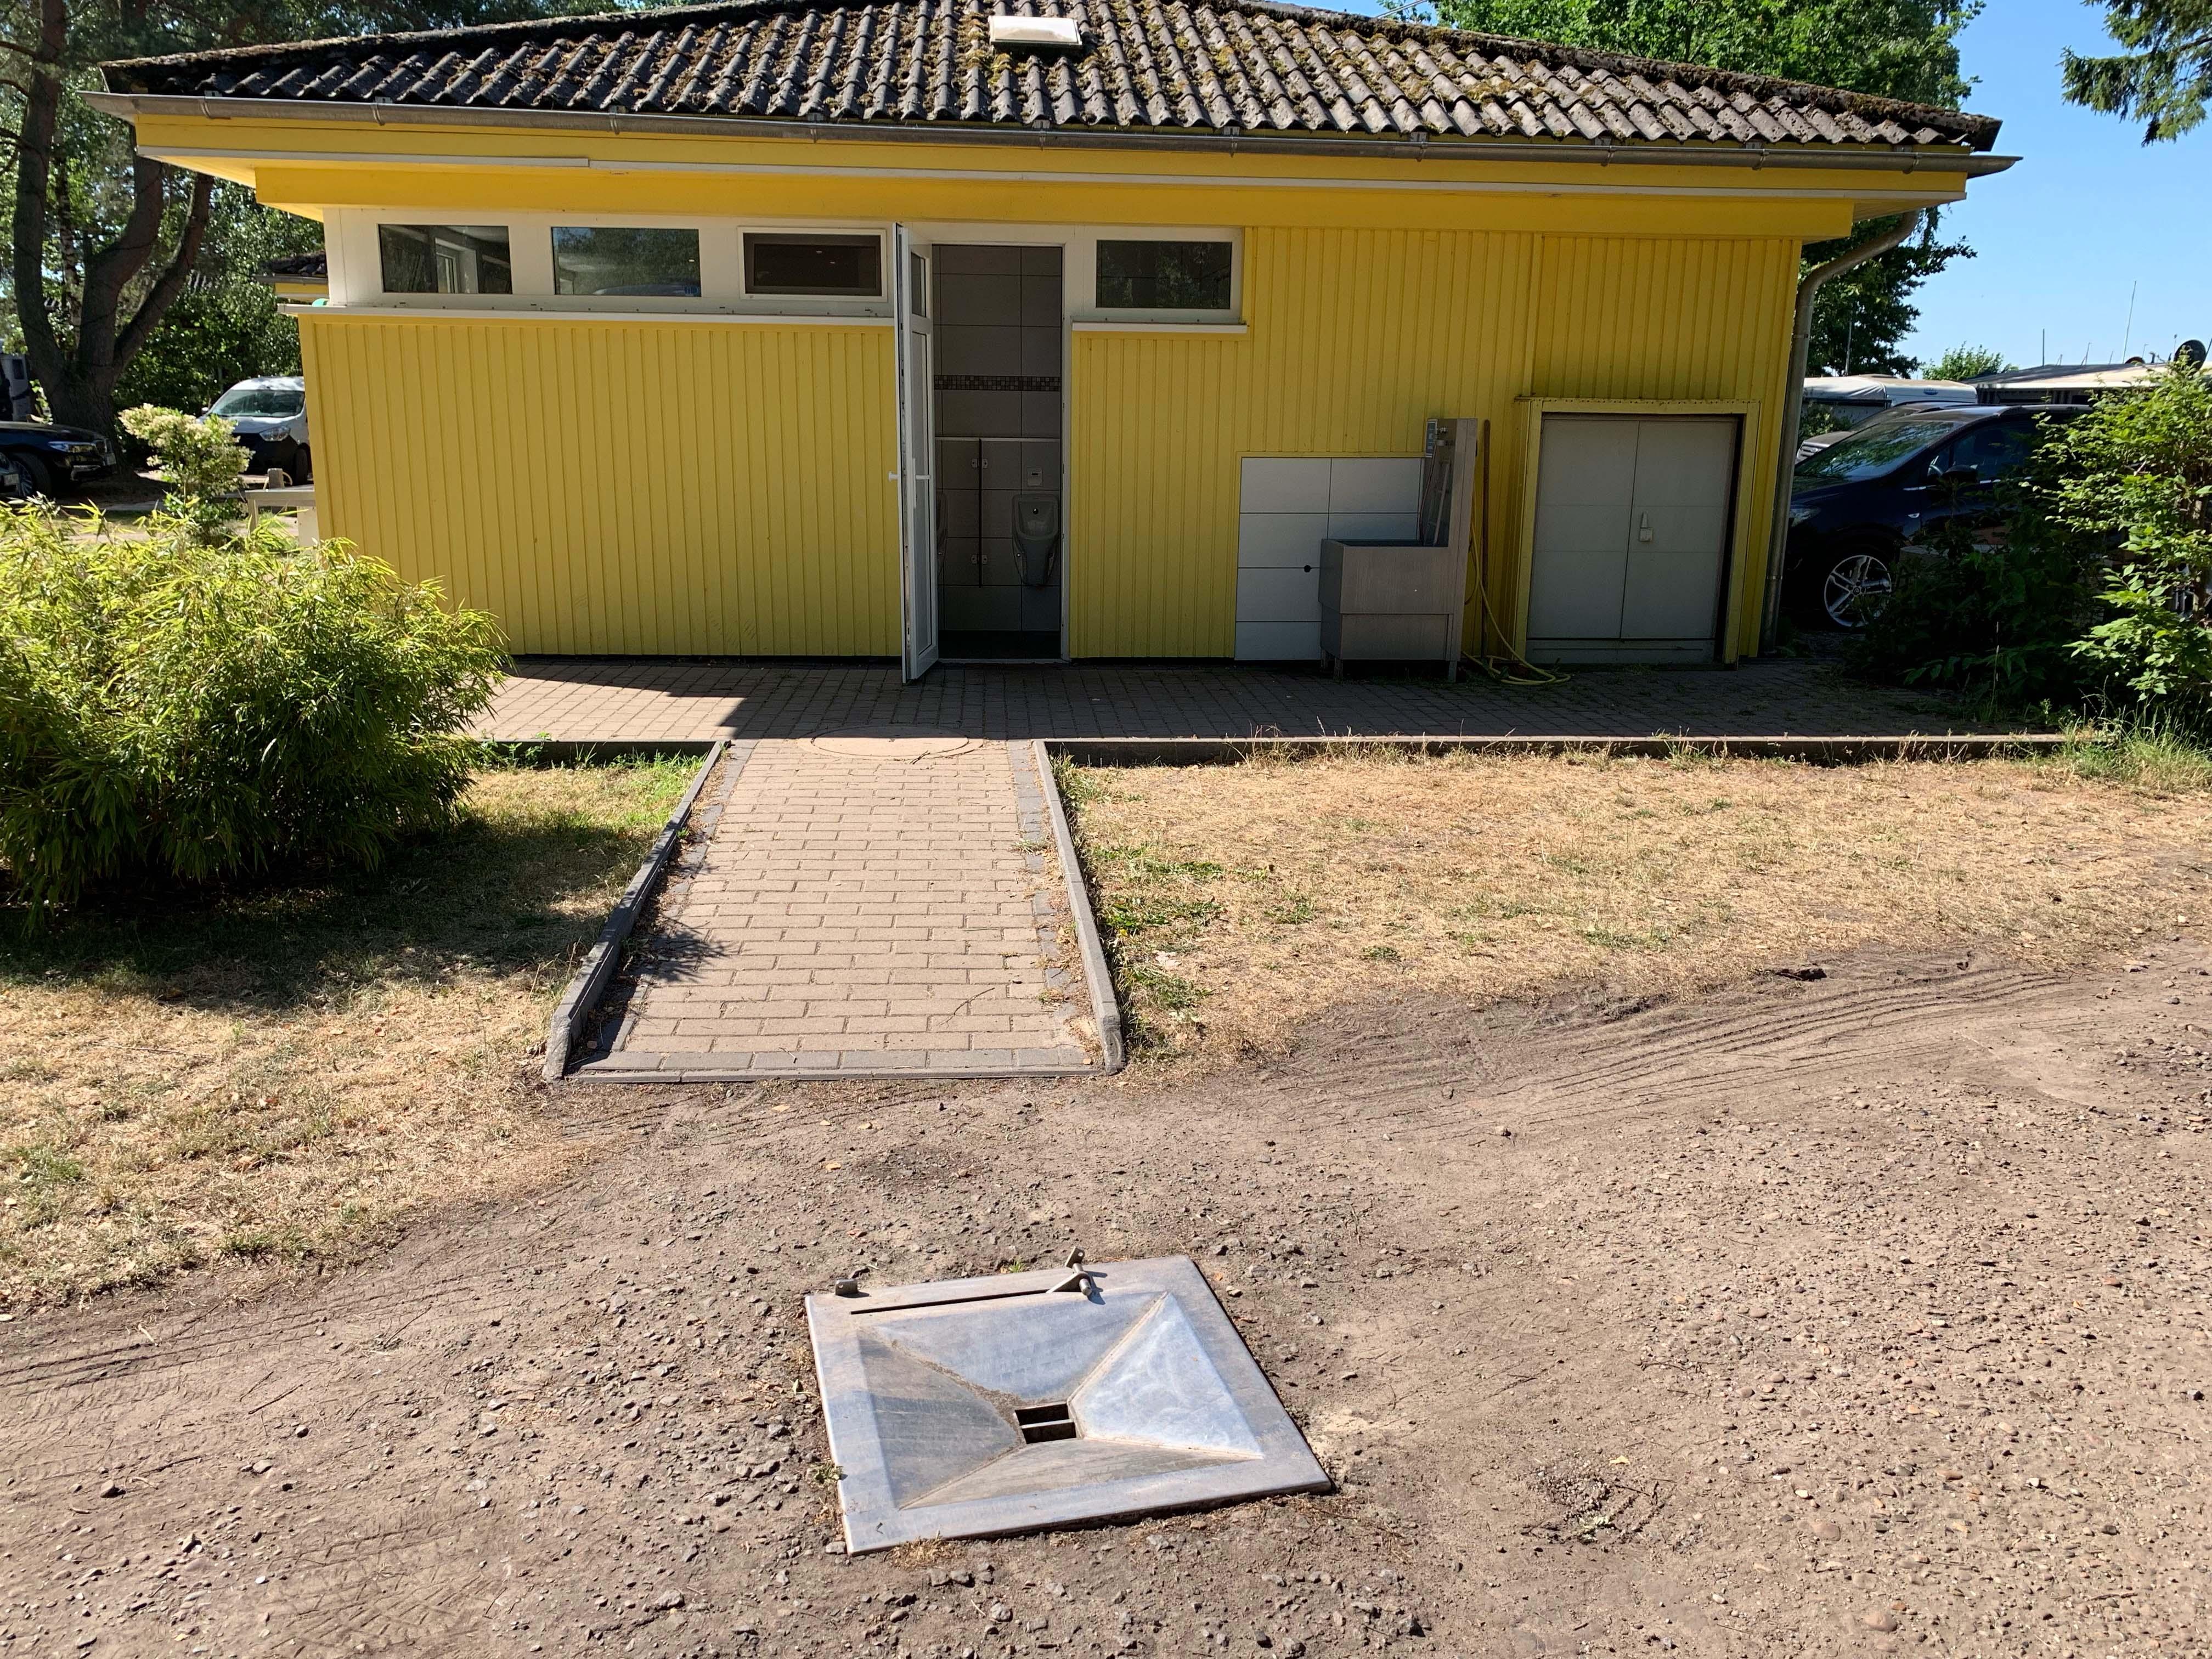 Campingplatz Mardorf04